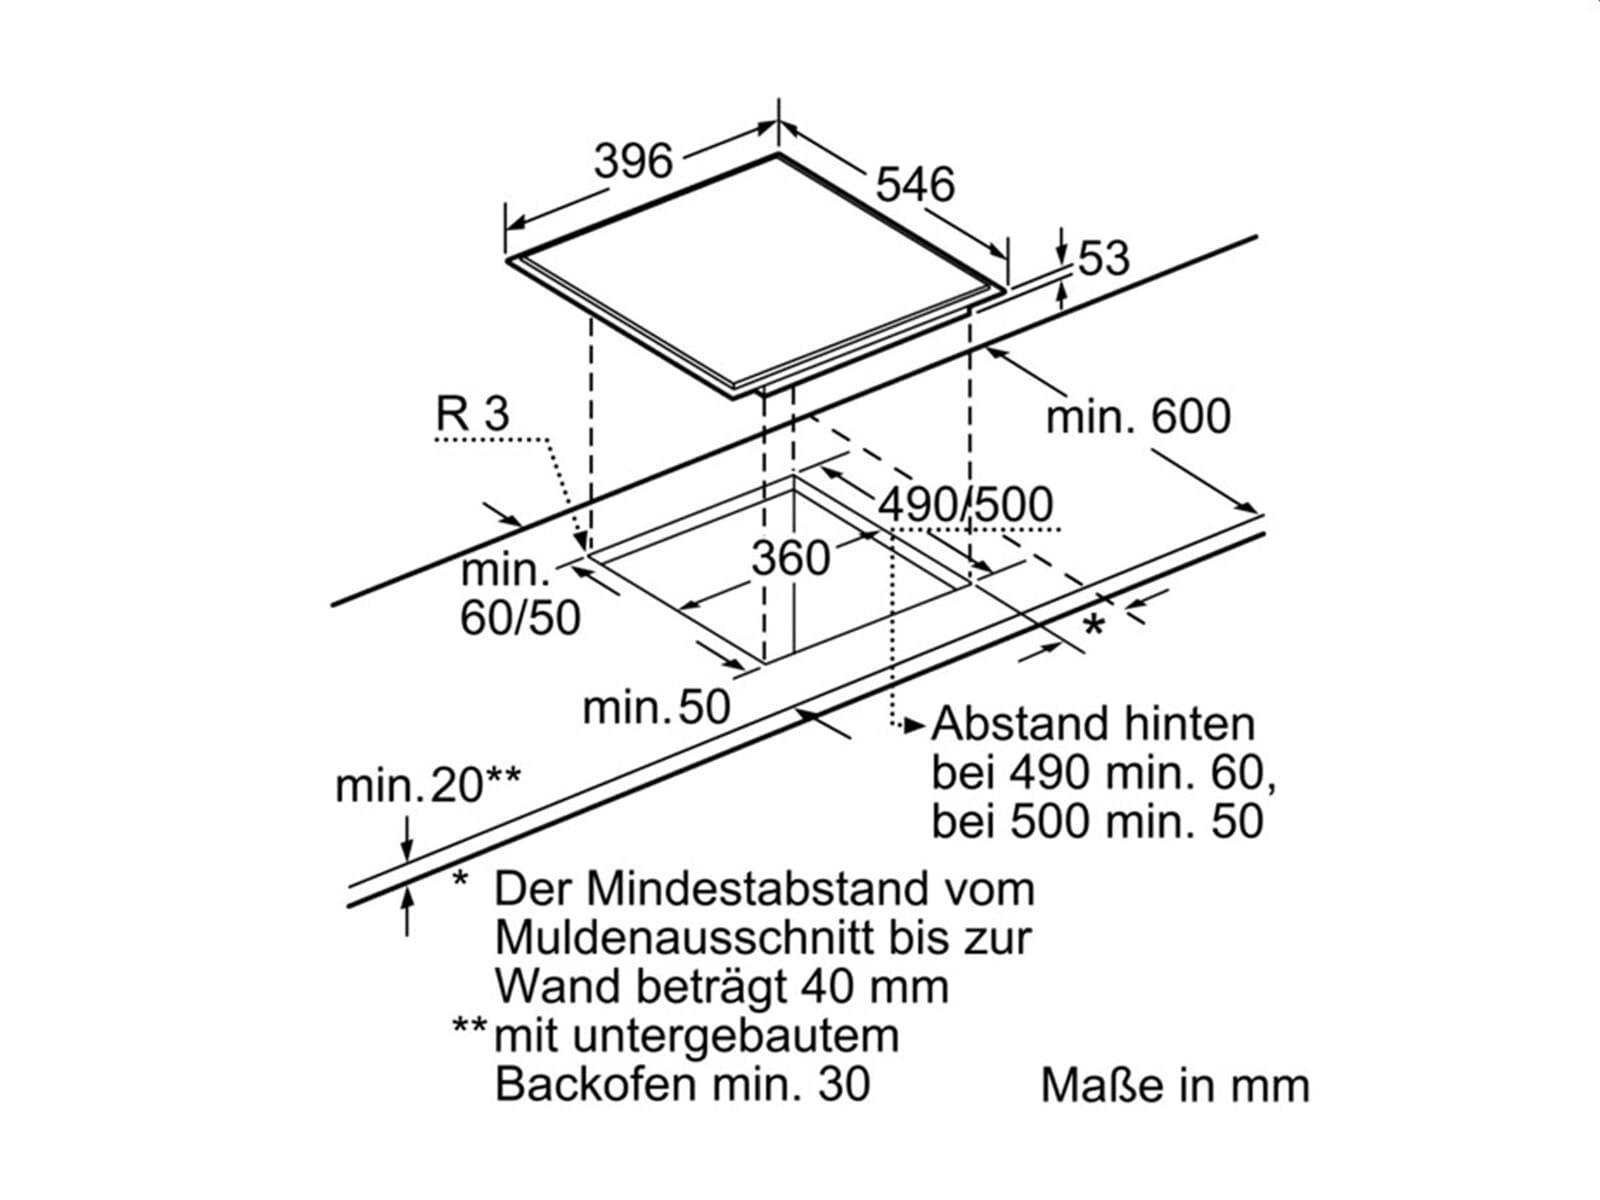 neff nk 4445 n domino induktion glaskeramik kochfeld autark f r 614 90 eur. Black Bedroom Furniture Sets. Home Design Ideas